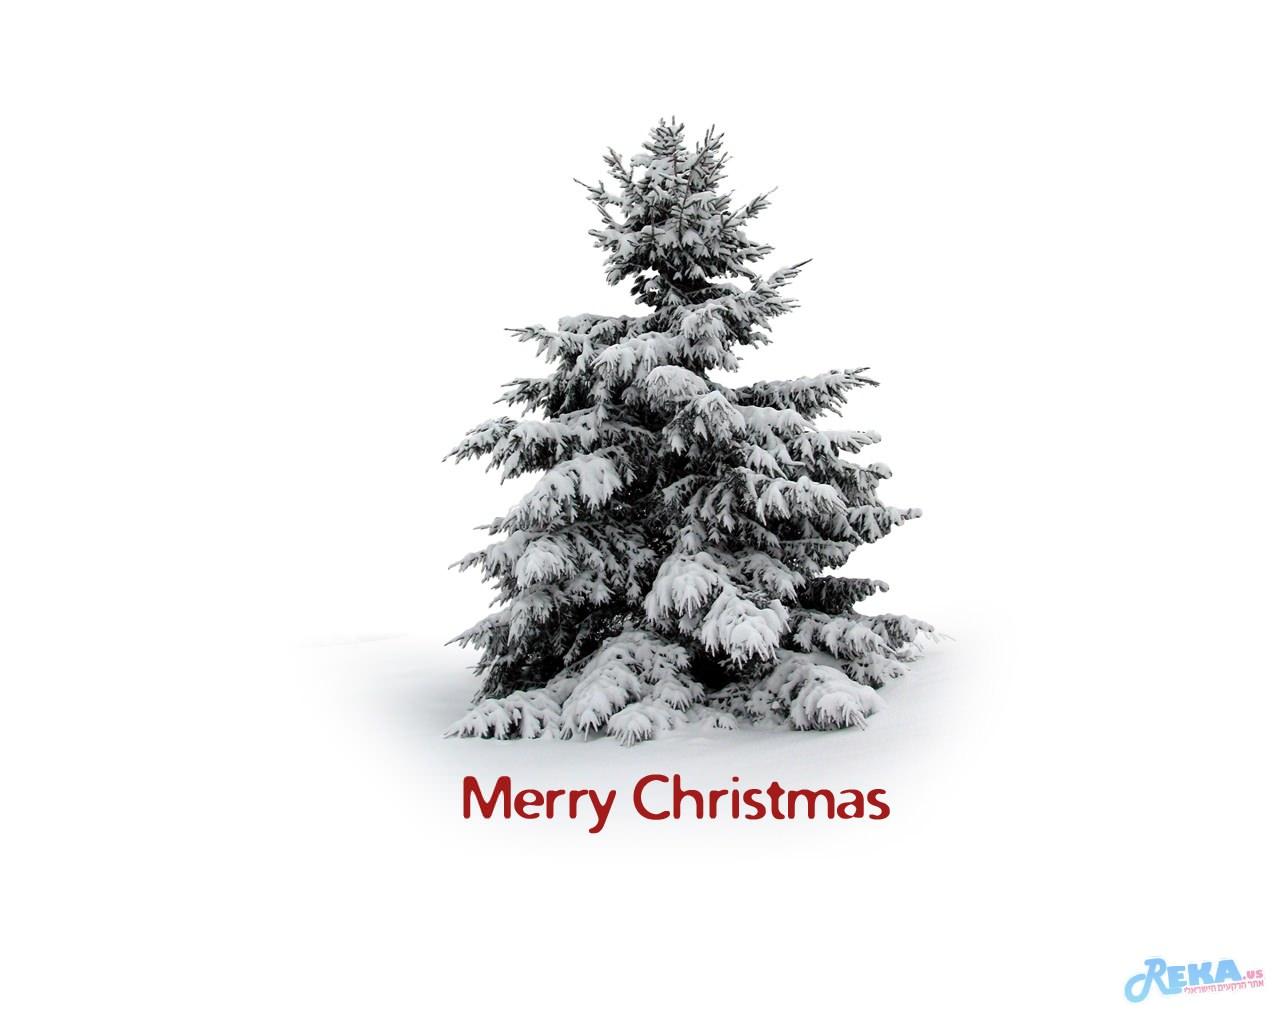 Simple_Christmas_by_dimant.jpg